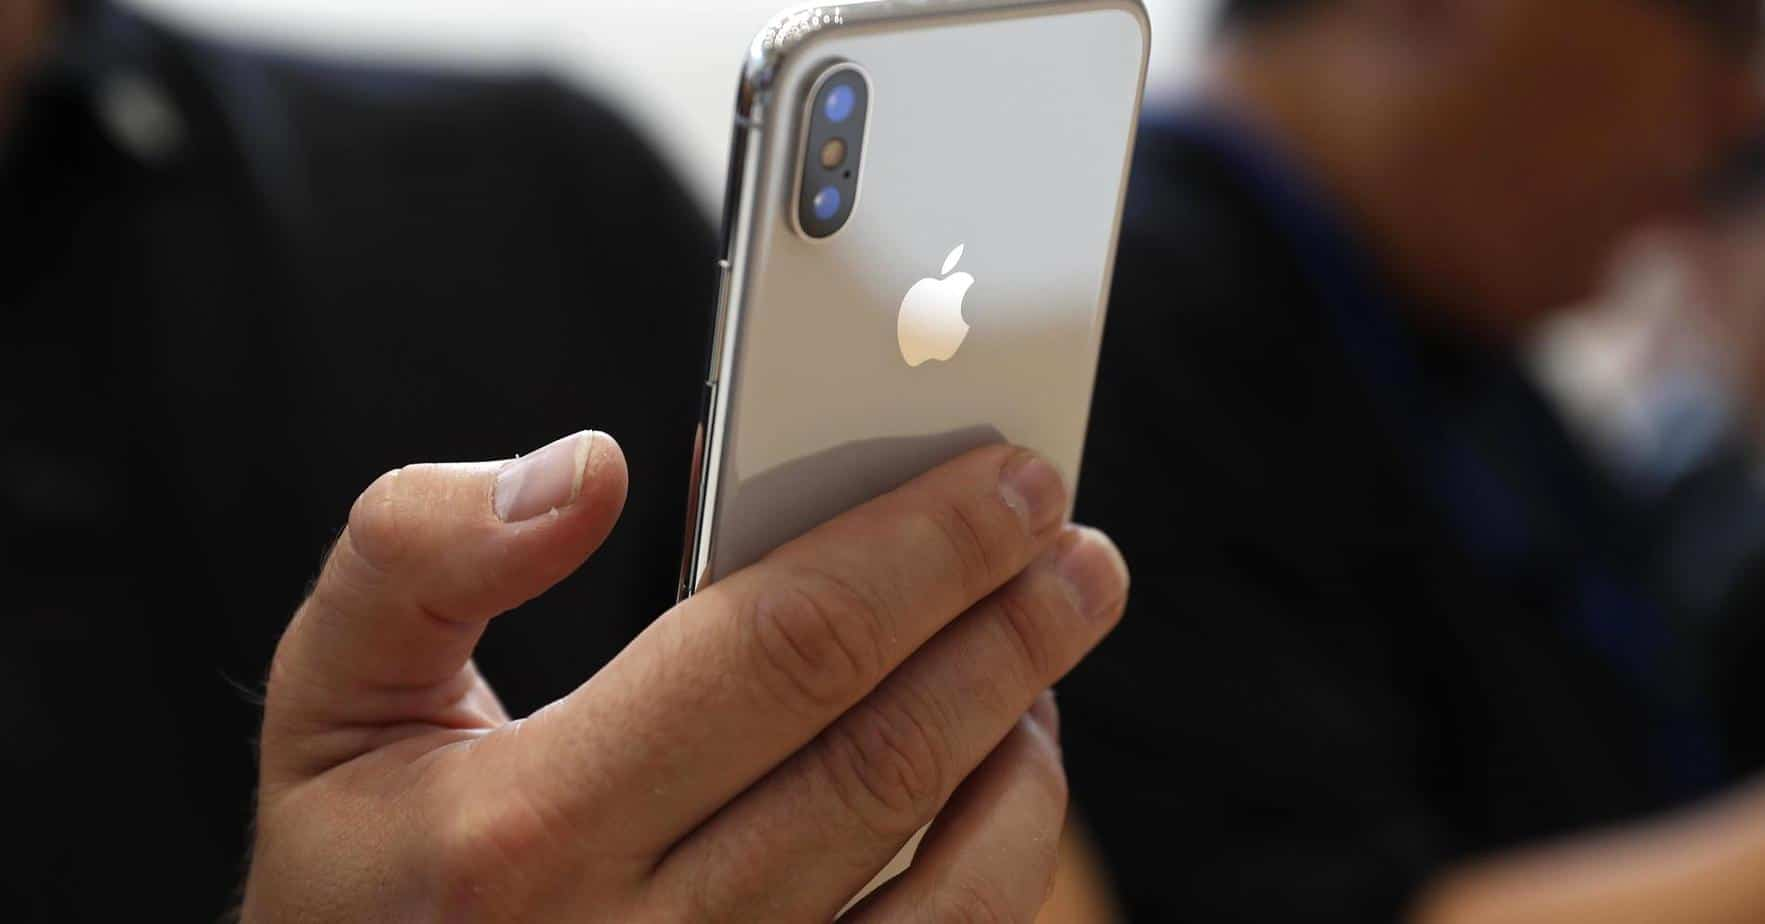 iphone leaking data